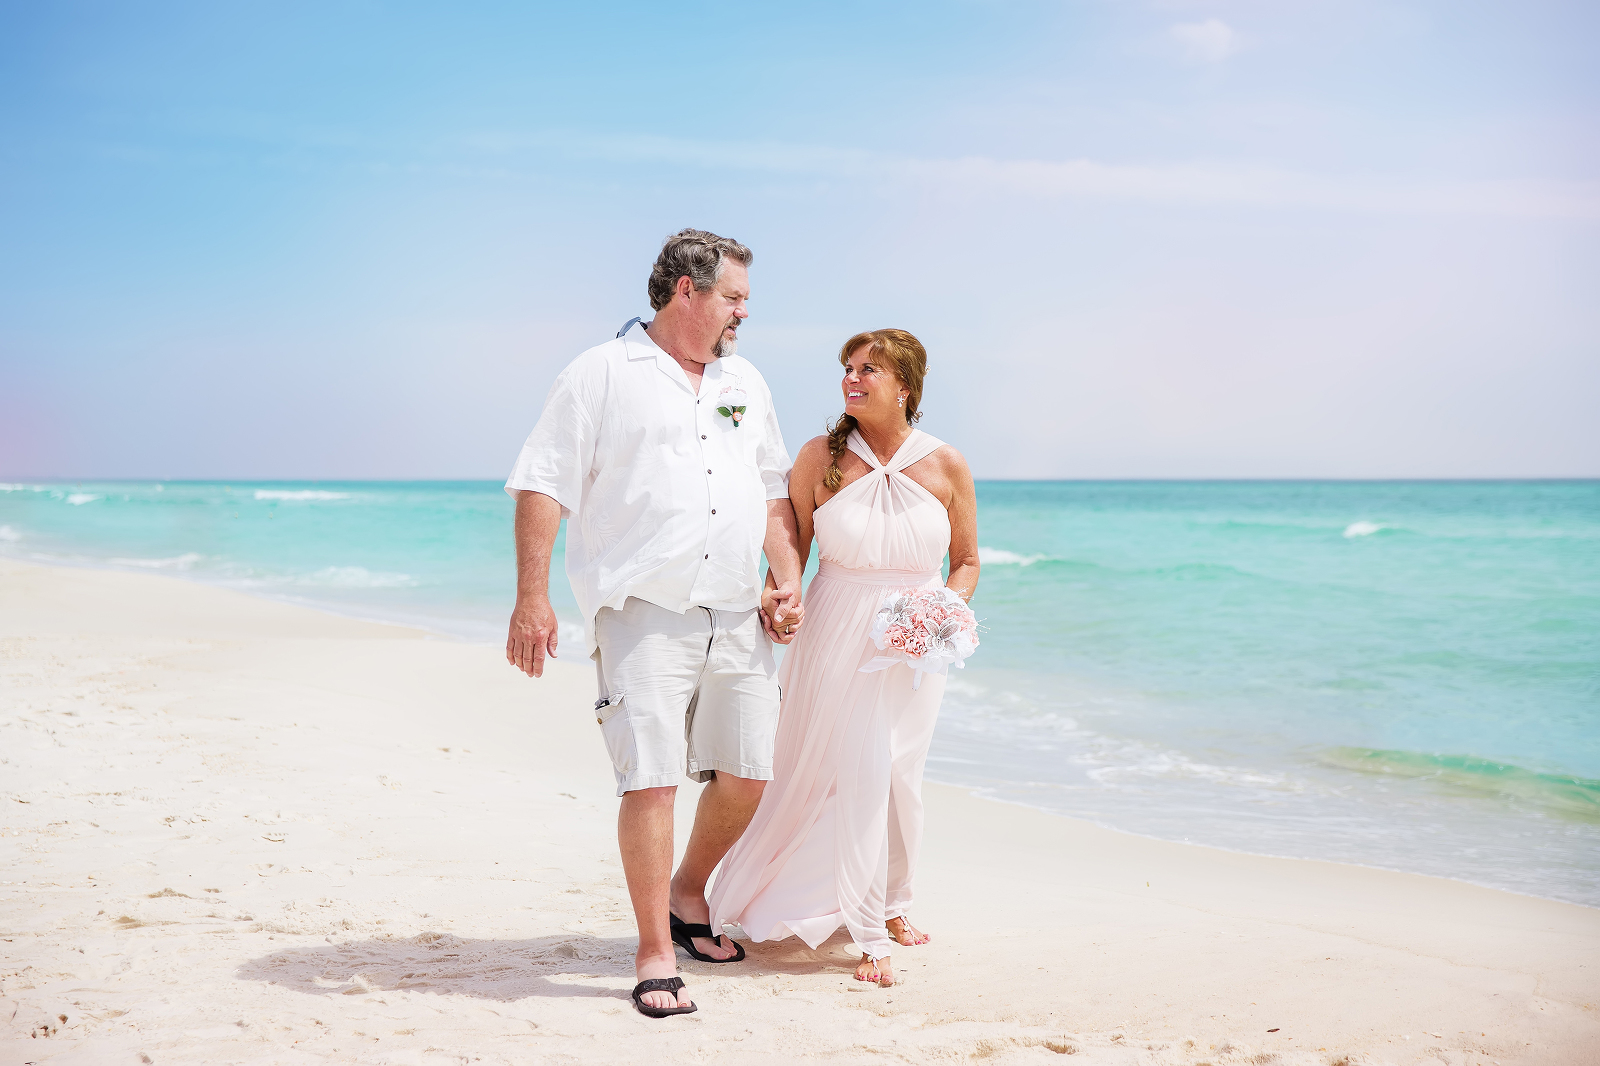 Panama City Beach Wedding, portraits